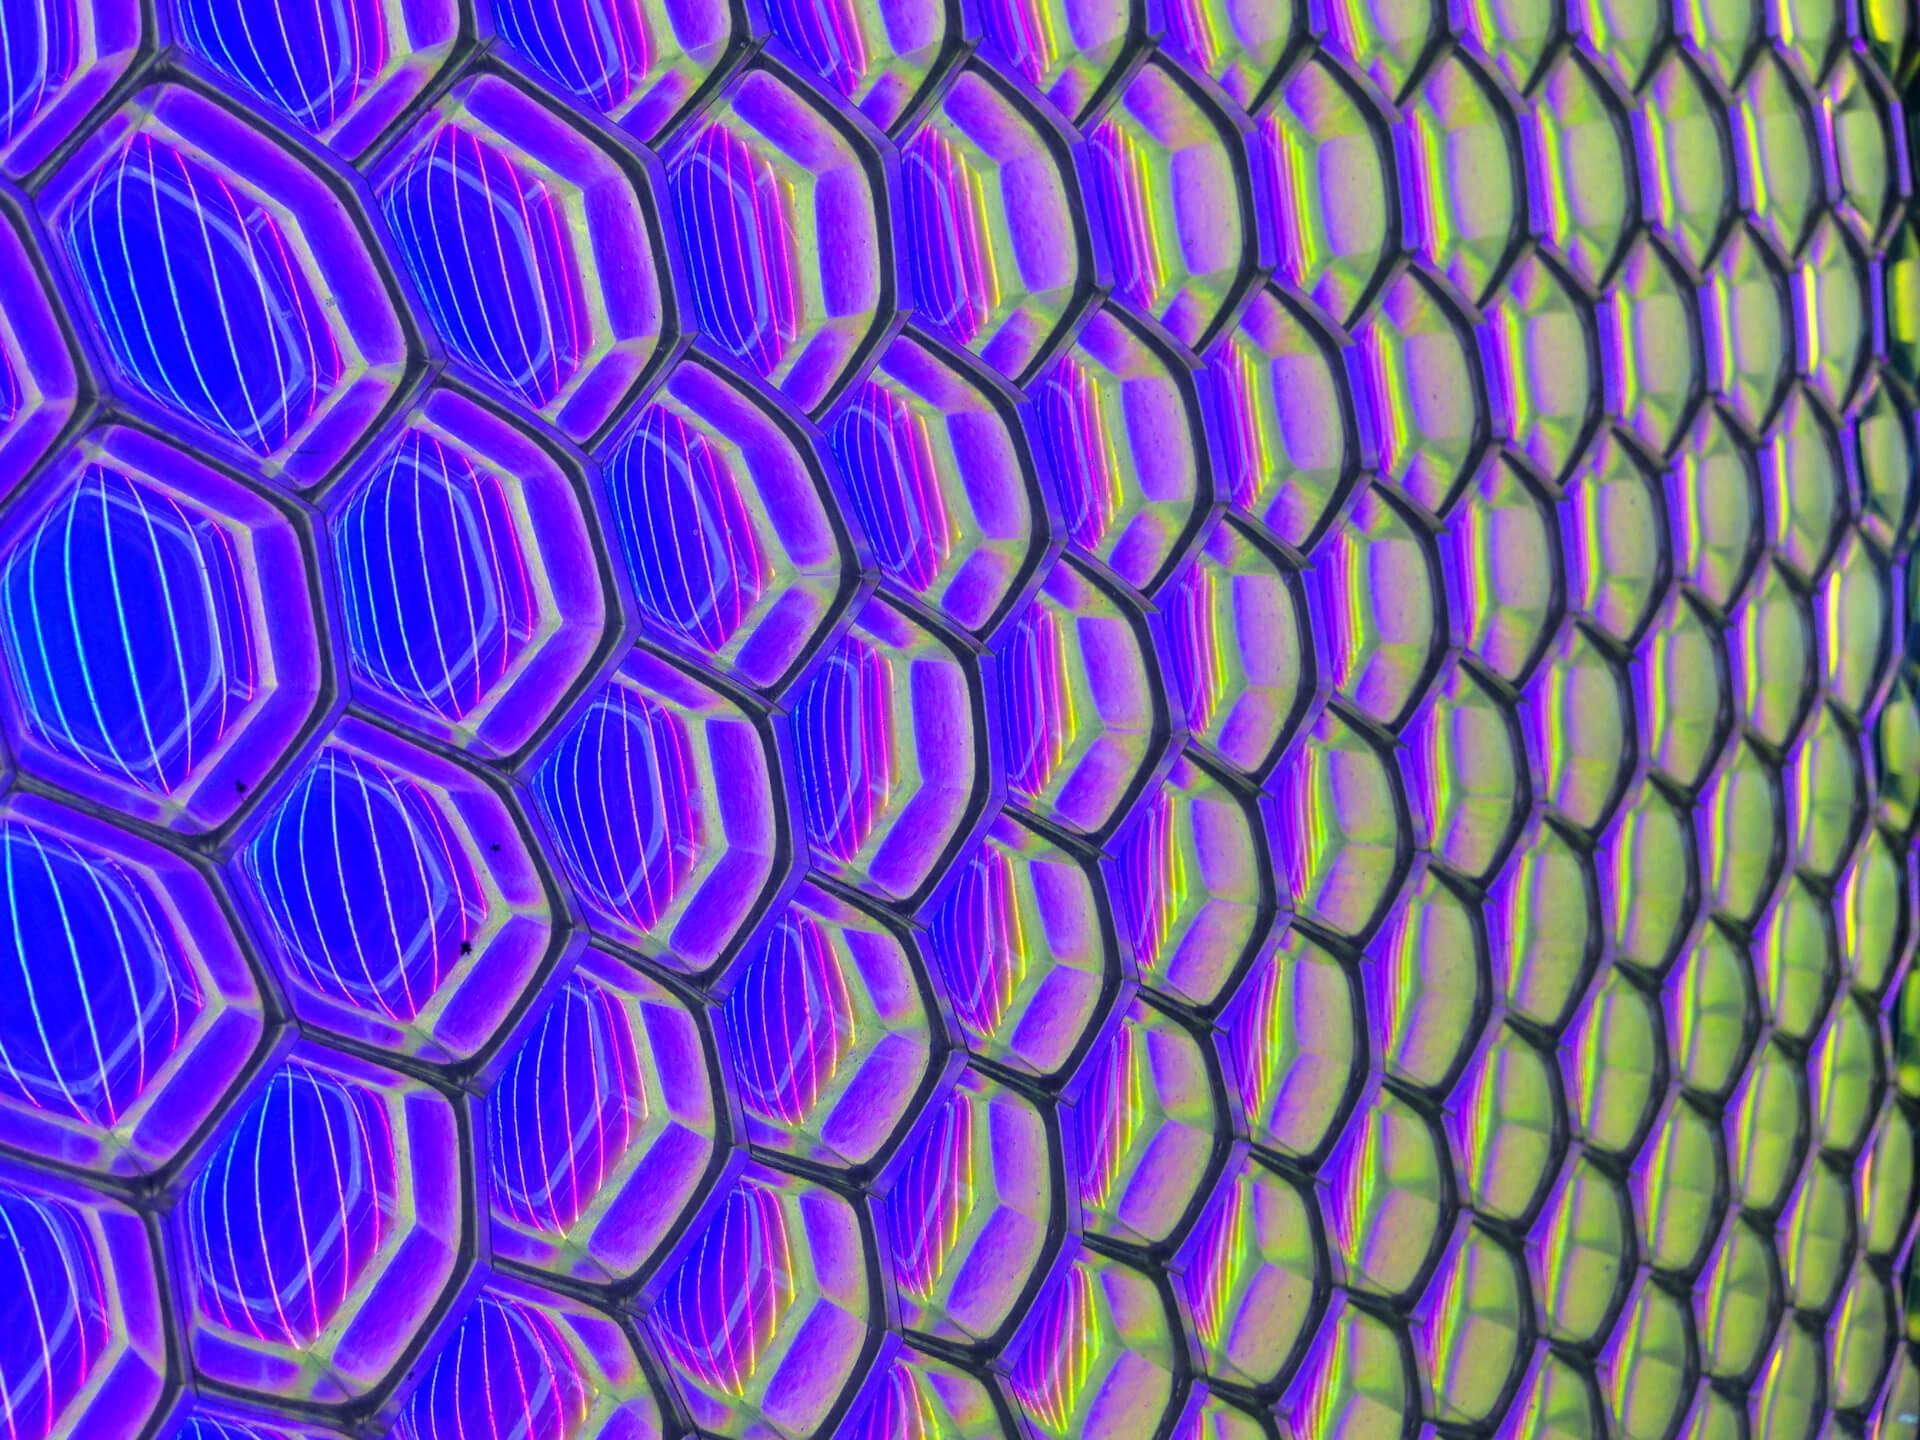 Decorative glass panels - B-Glow purple cells